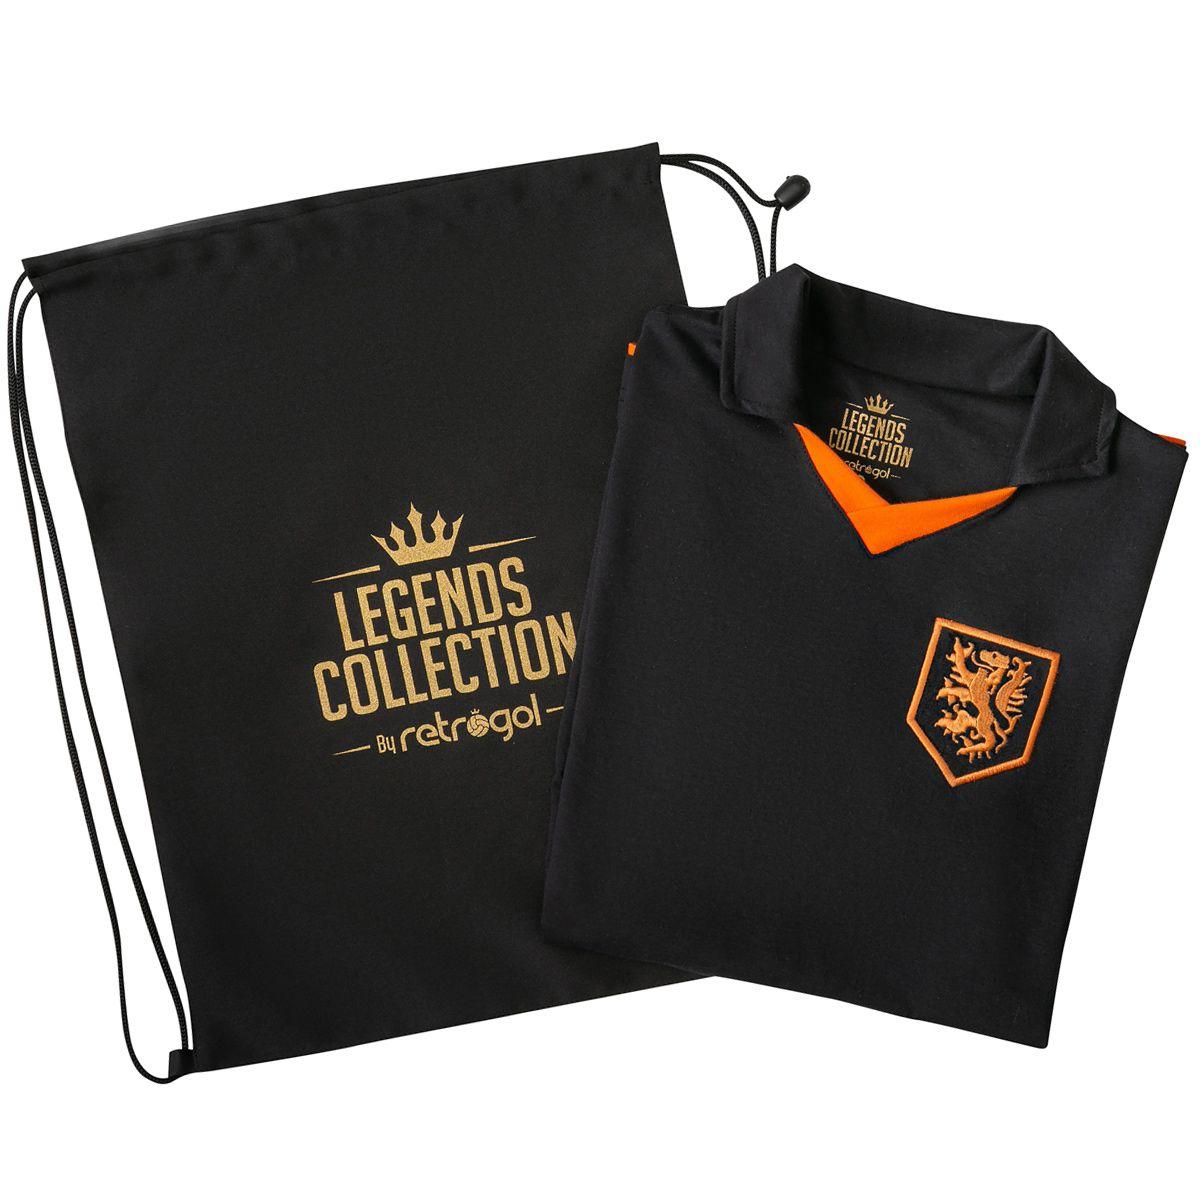 Camisa Holanda Retrô Legends Collection Preta + Sacola